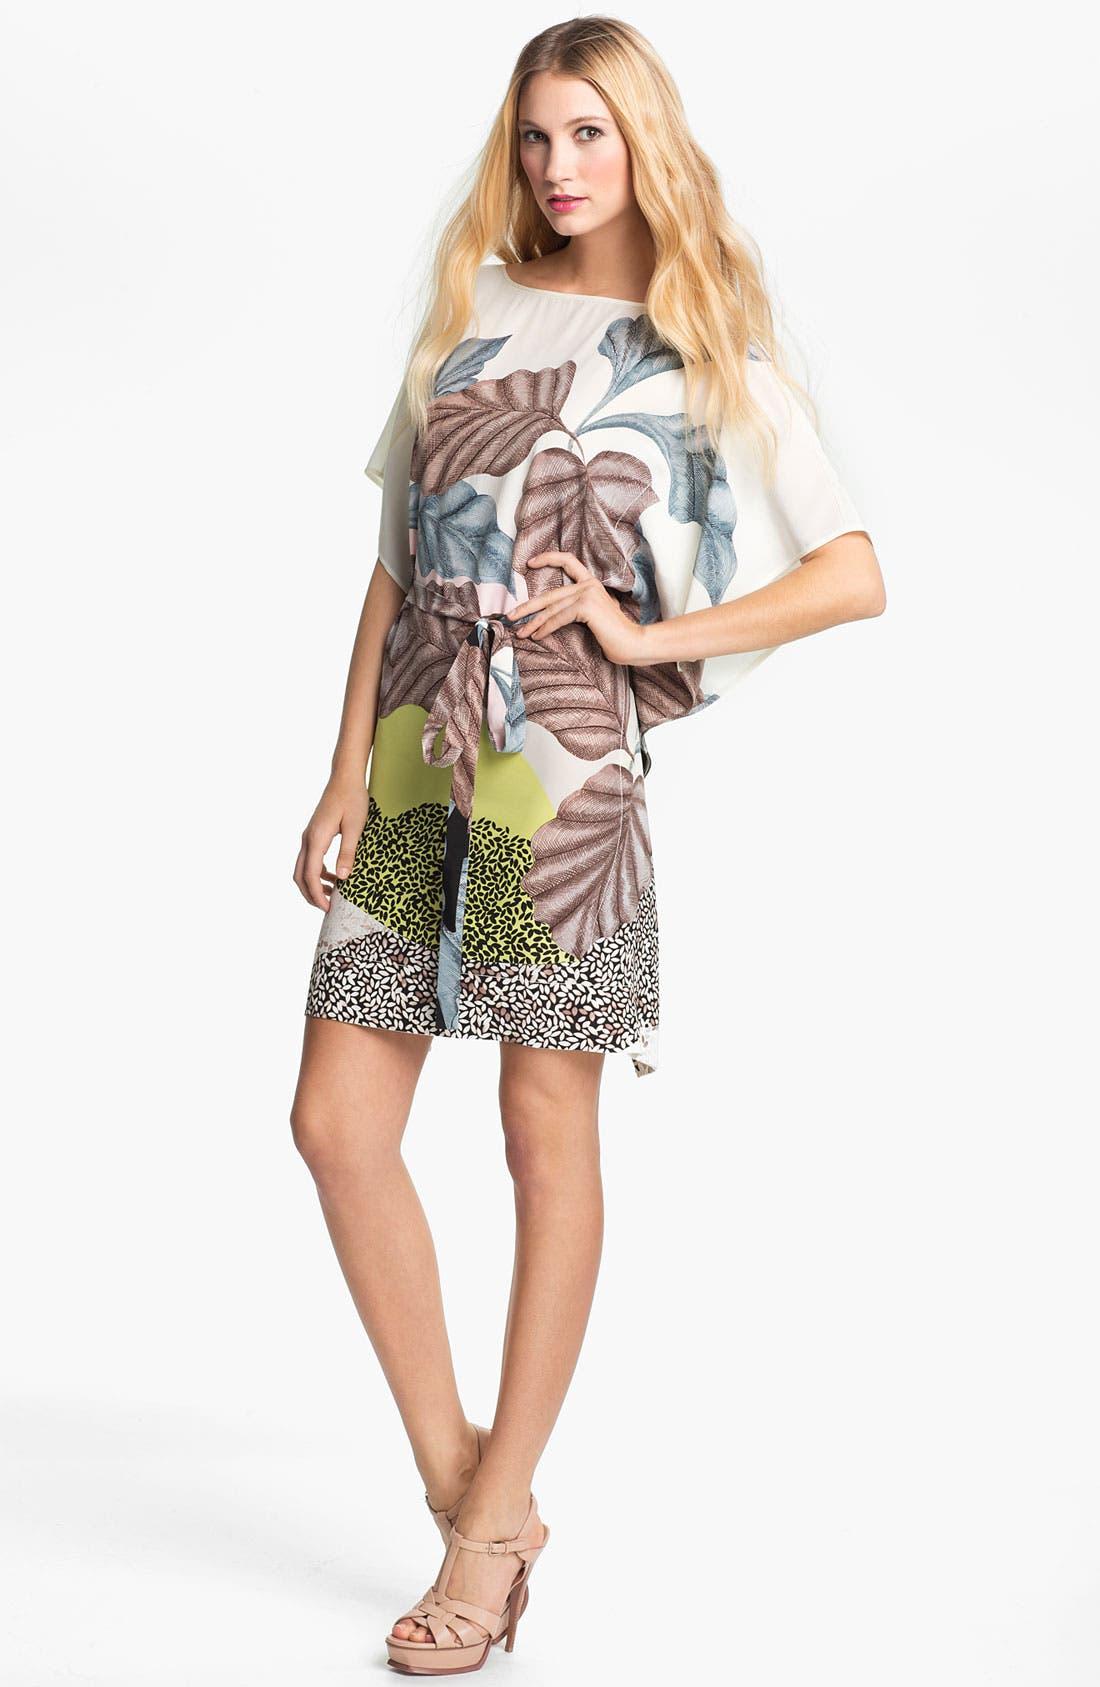 Alternate Image 1 Selected - Diane von Furstenberg 'Diane Hanky' Print Silk Dress